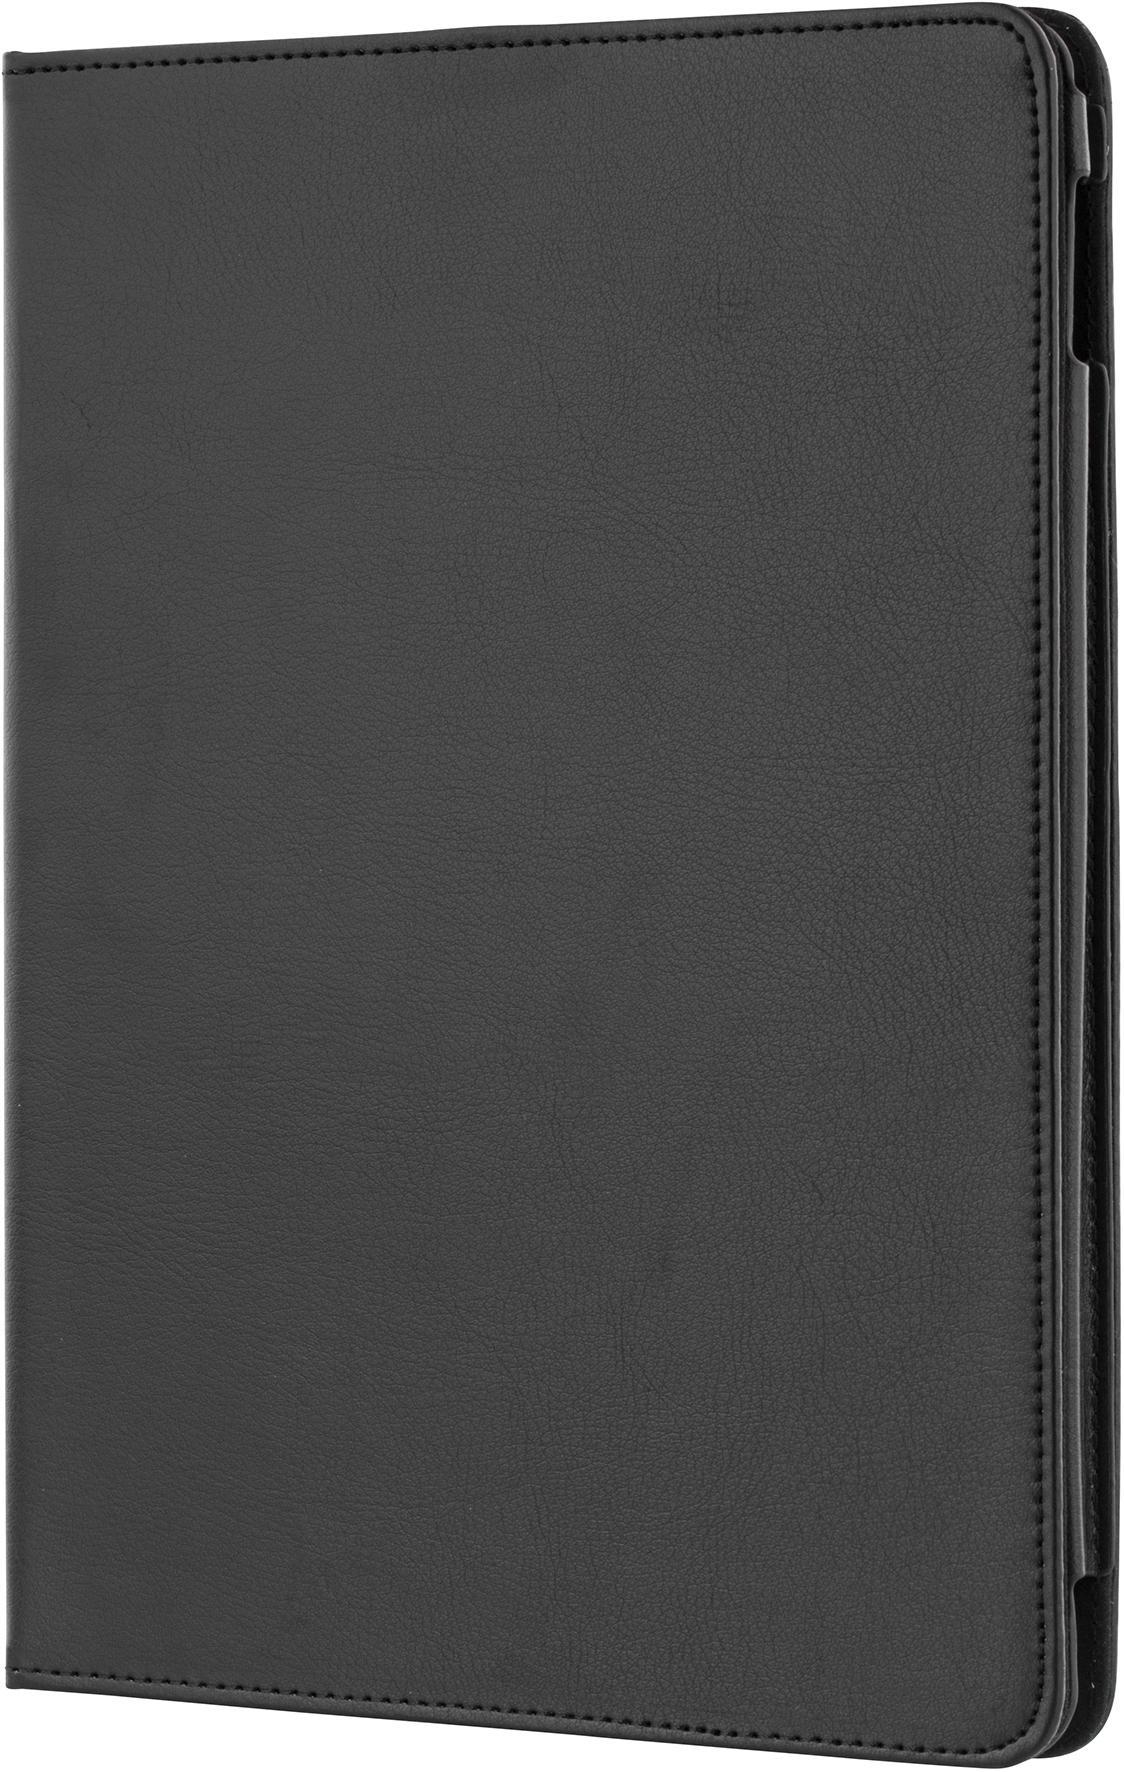 Deltaco Fodral Deltaco iPad Air2/Pro